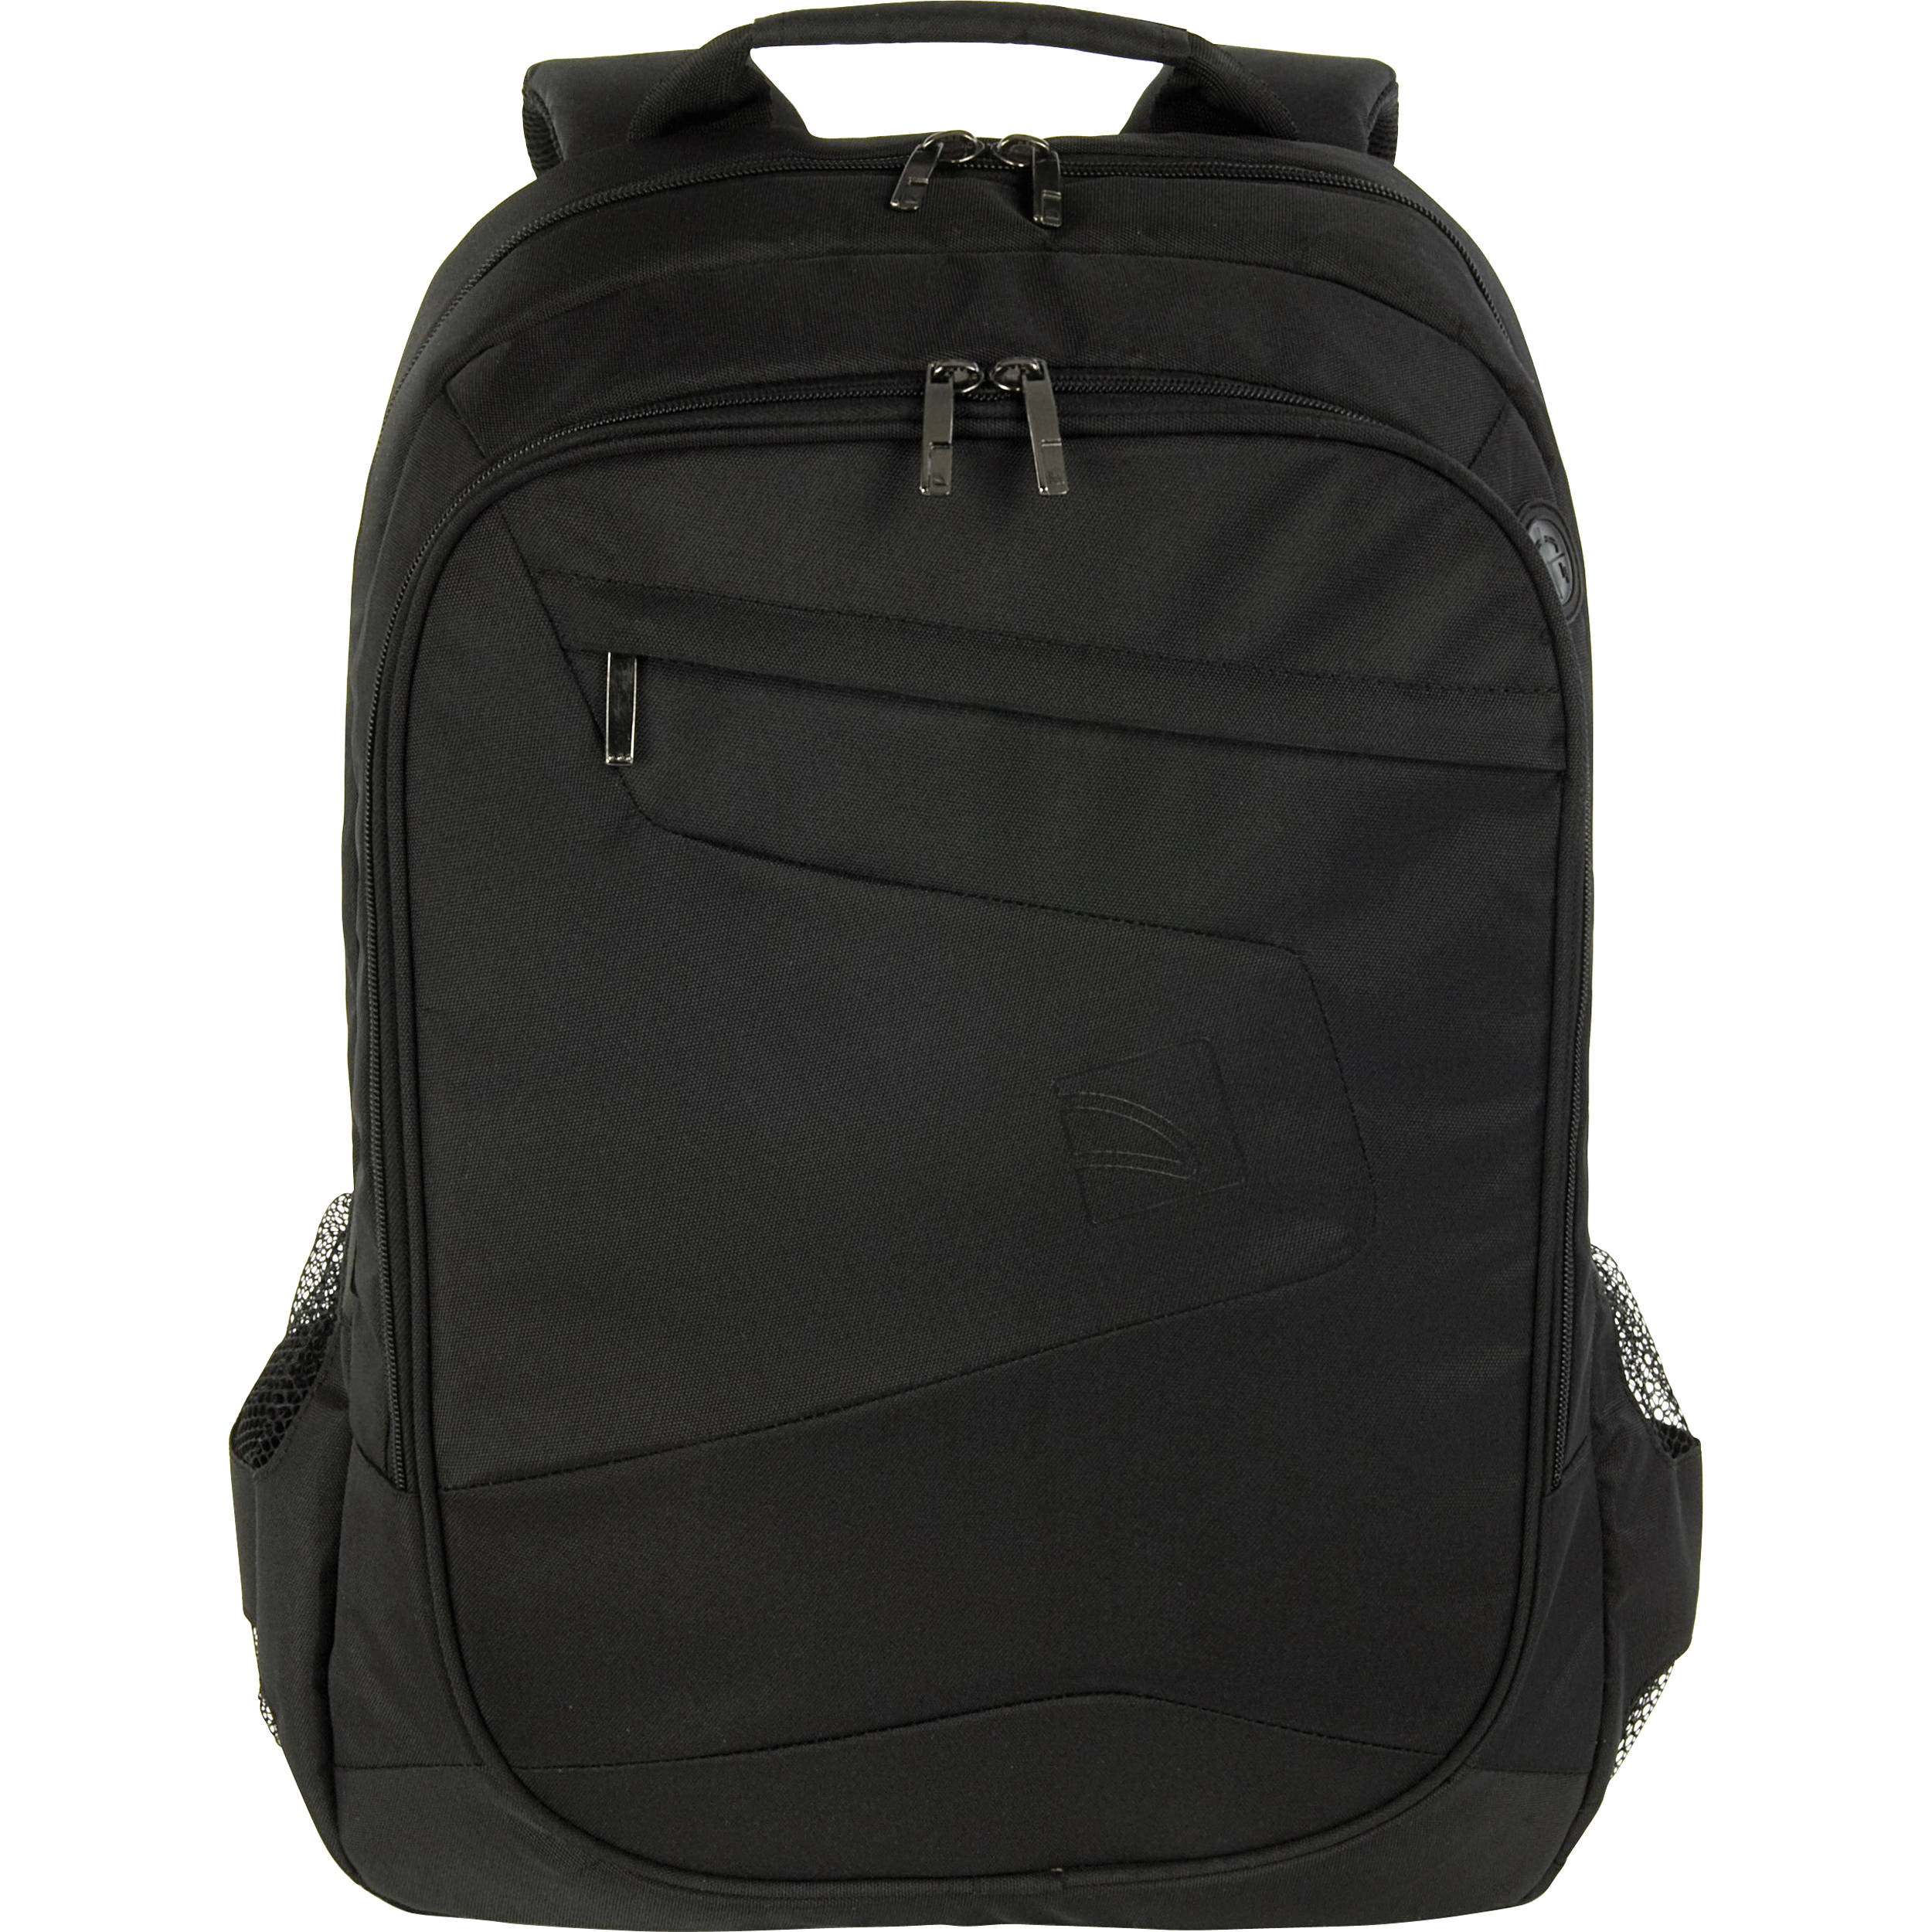 "Tucano Lato Backpack MacBook 15"" - 17"""